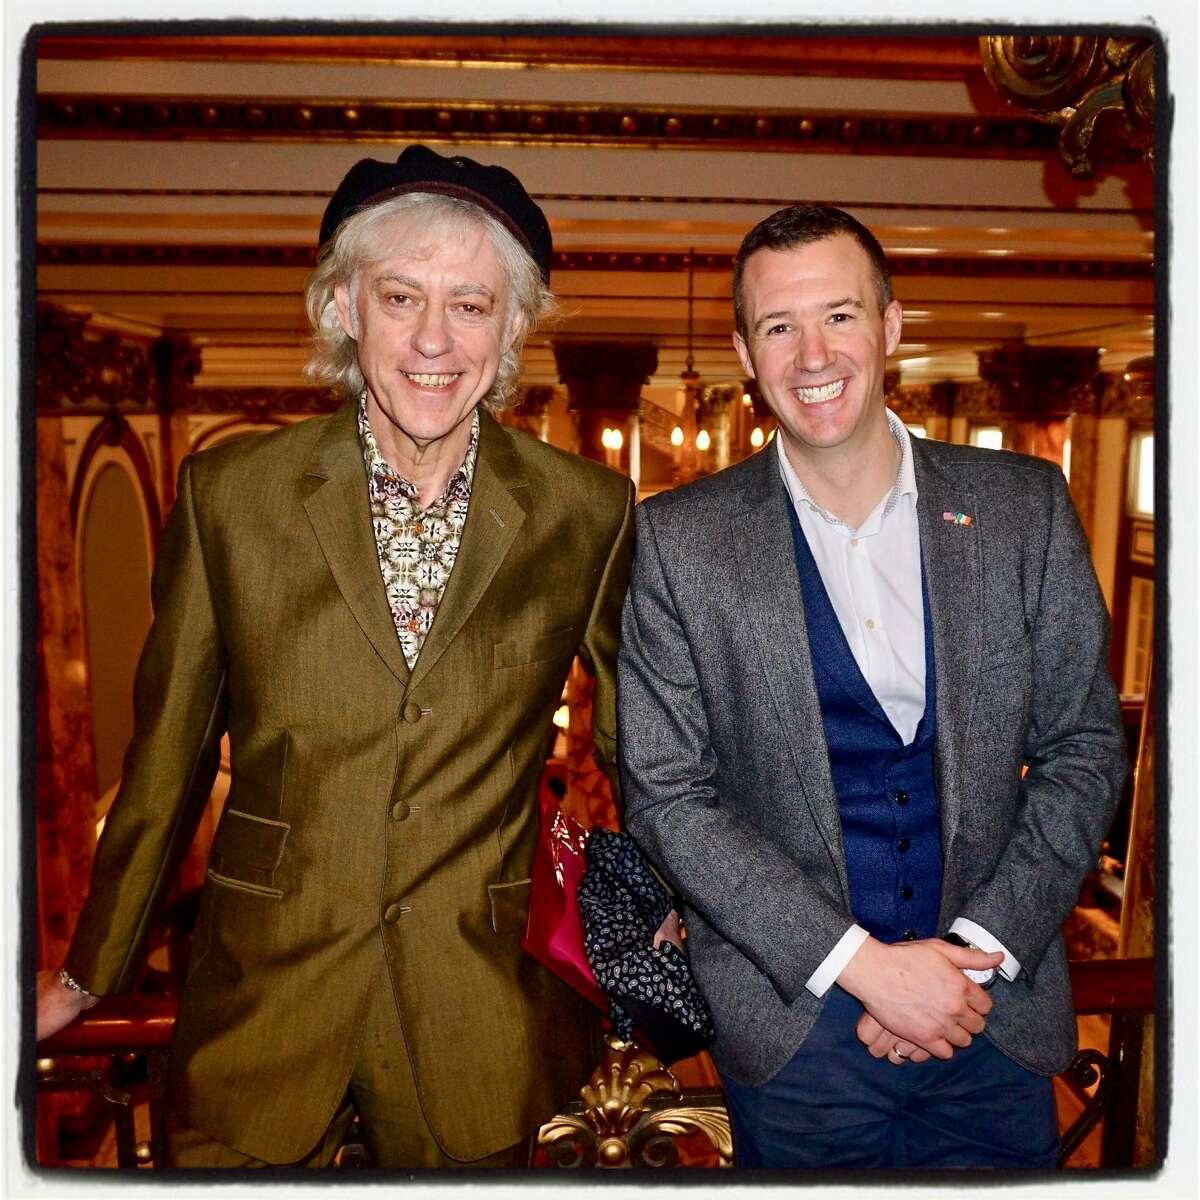 Sir Bob Geldof (left) and Republic of Ireland Consul General Robert O'Driscoll at the Fairmont Hotel. Feb. 18, 2018.